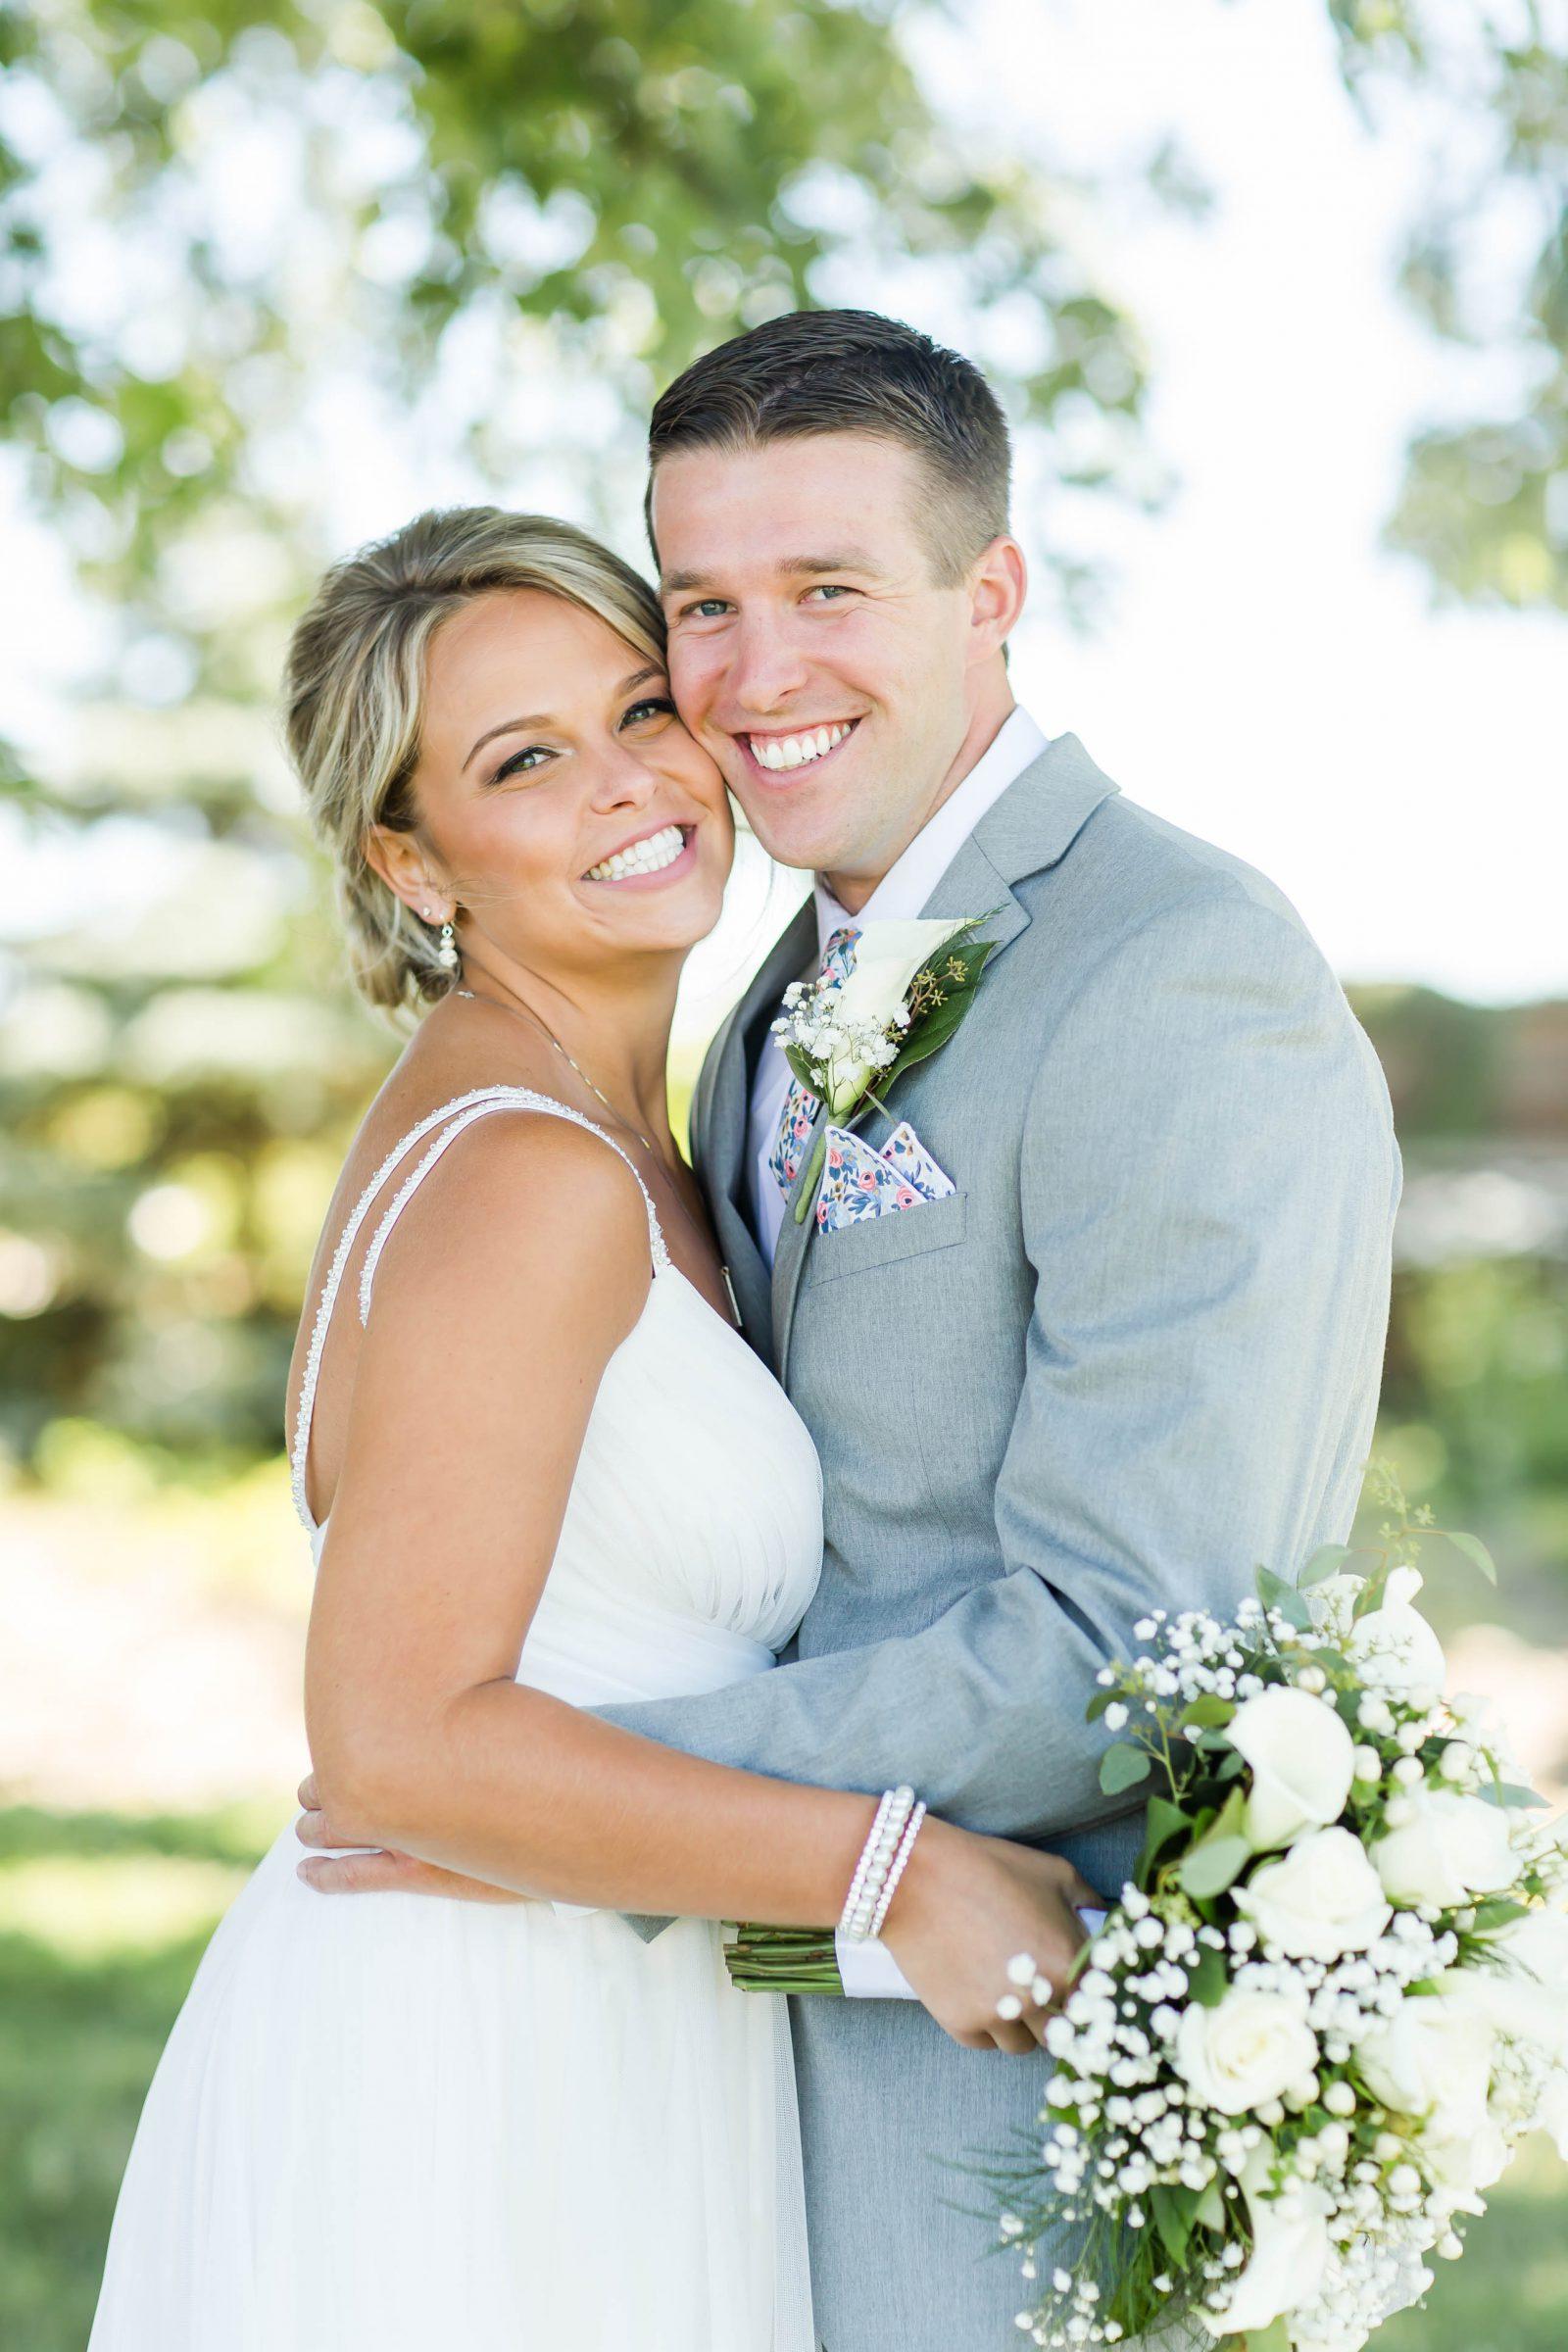 peacock-ridge-summer-wedding-photographer-akron-ohio-loren-jackson-photography-33